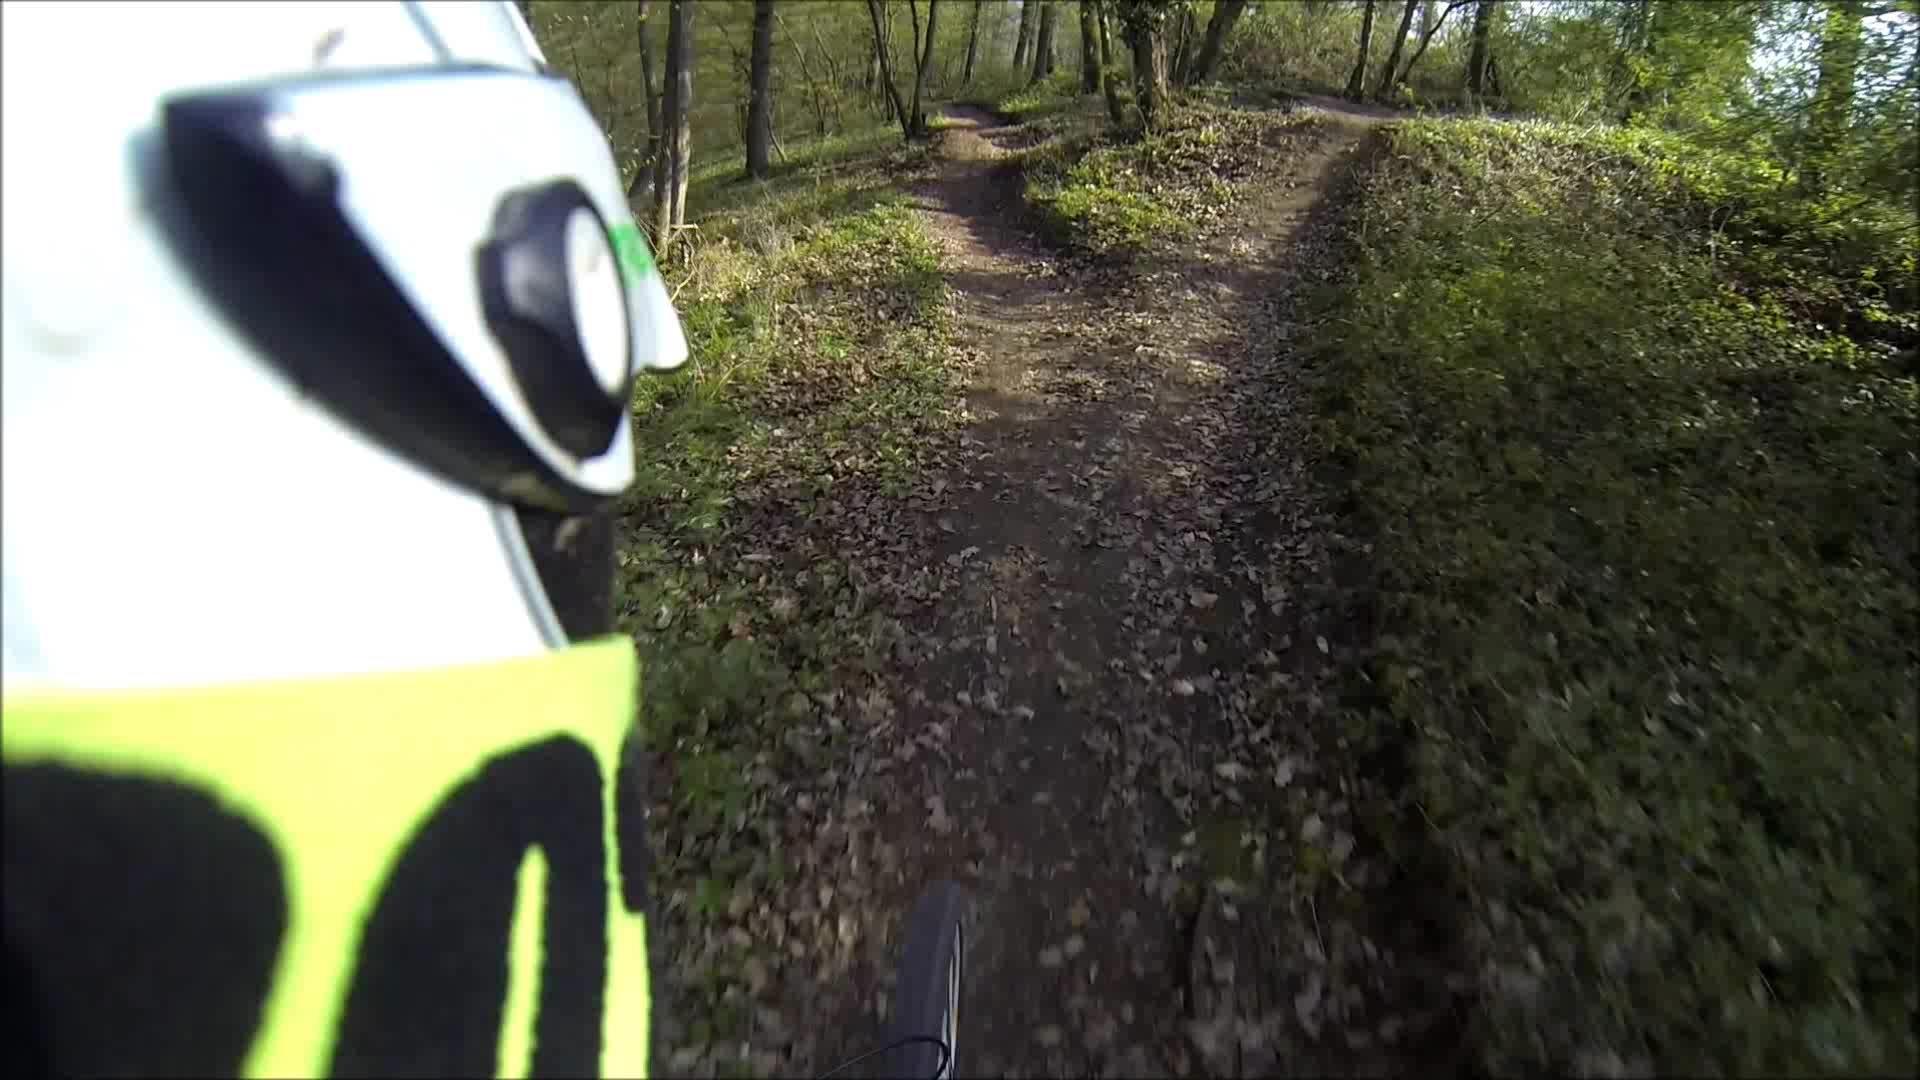 Bikepark-Boppard Raceline!